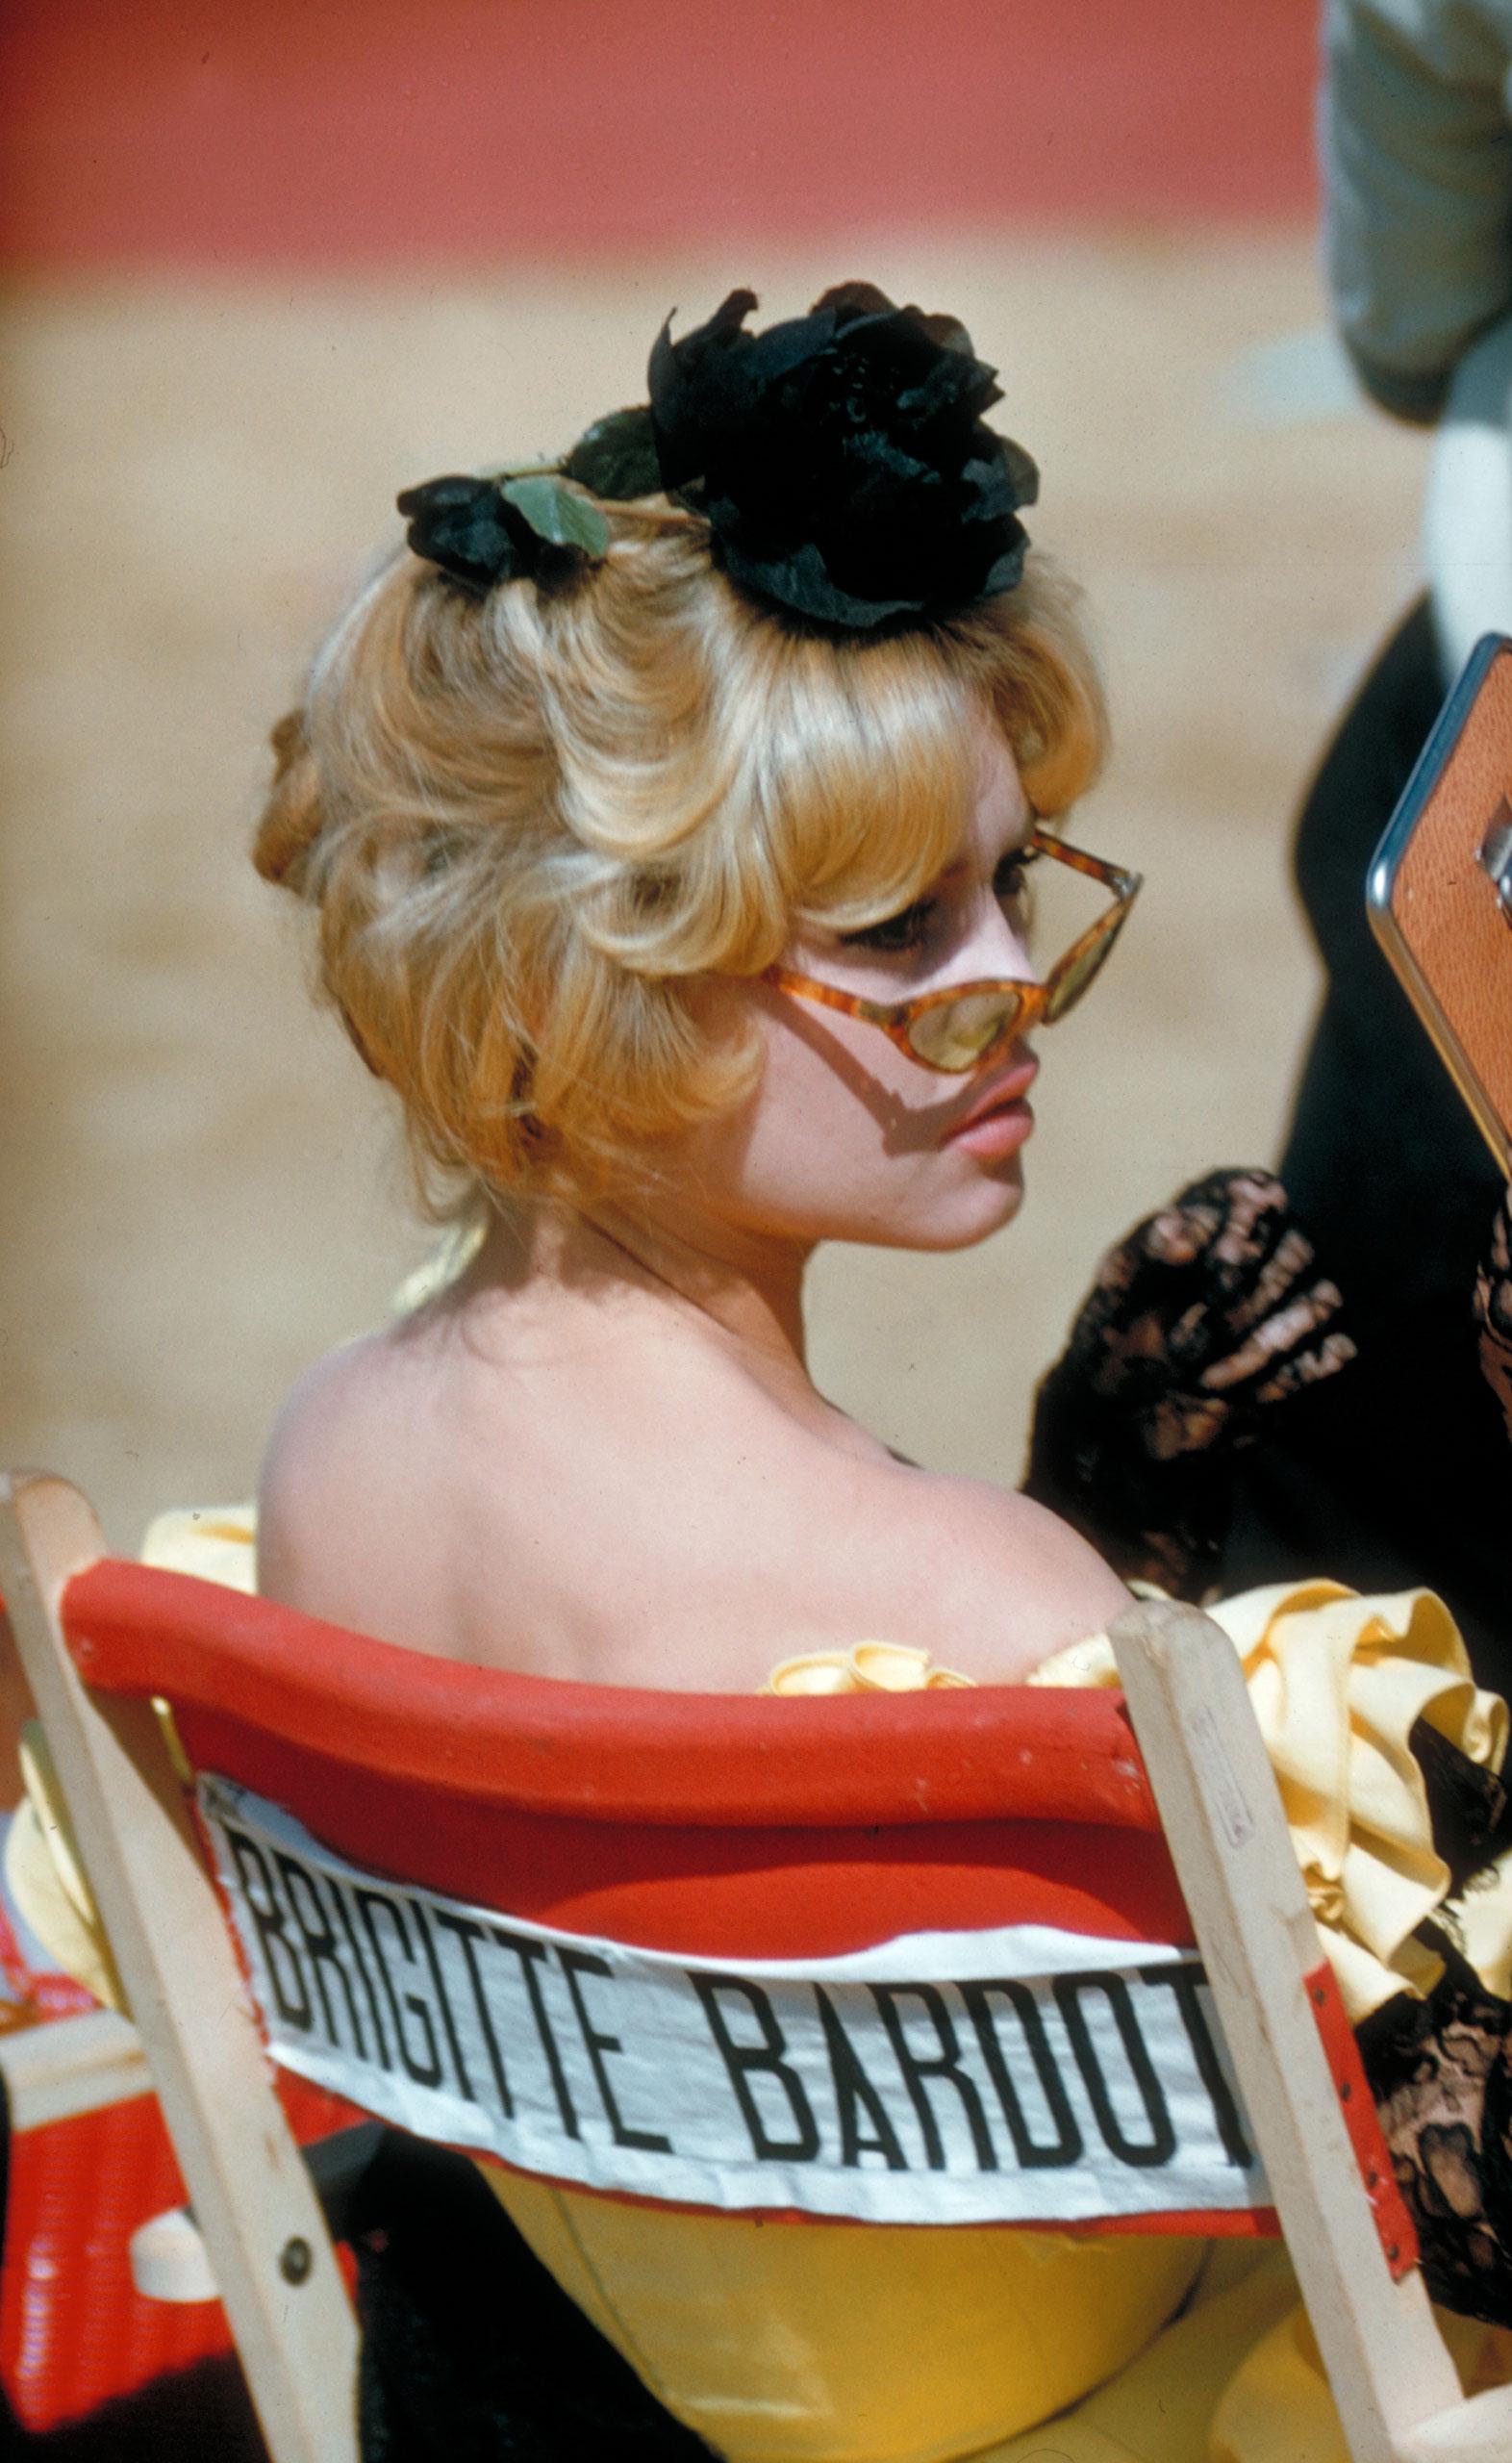 Brigitte Bardot during break on location filming of <i>La Femme et le Pantin</i>, Spain, 1958.